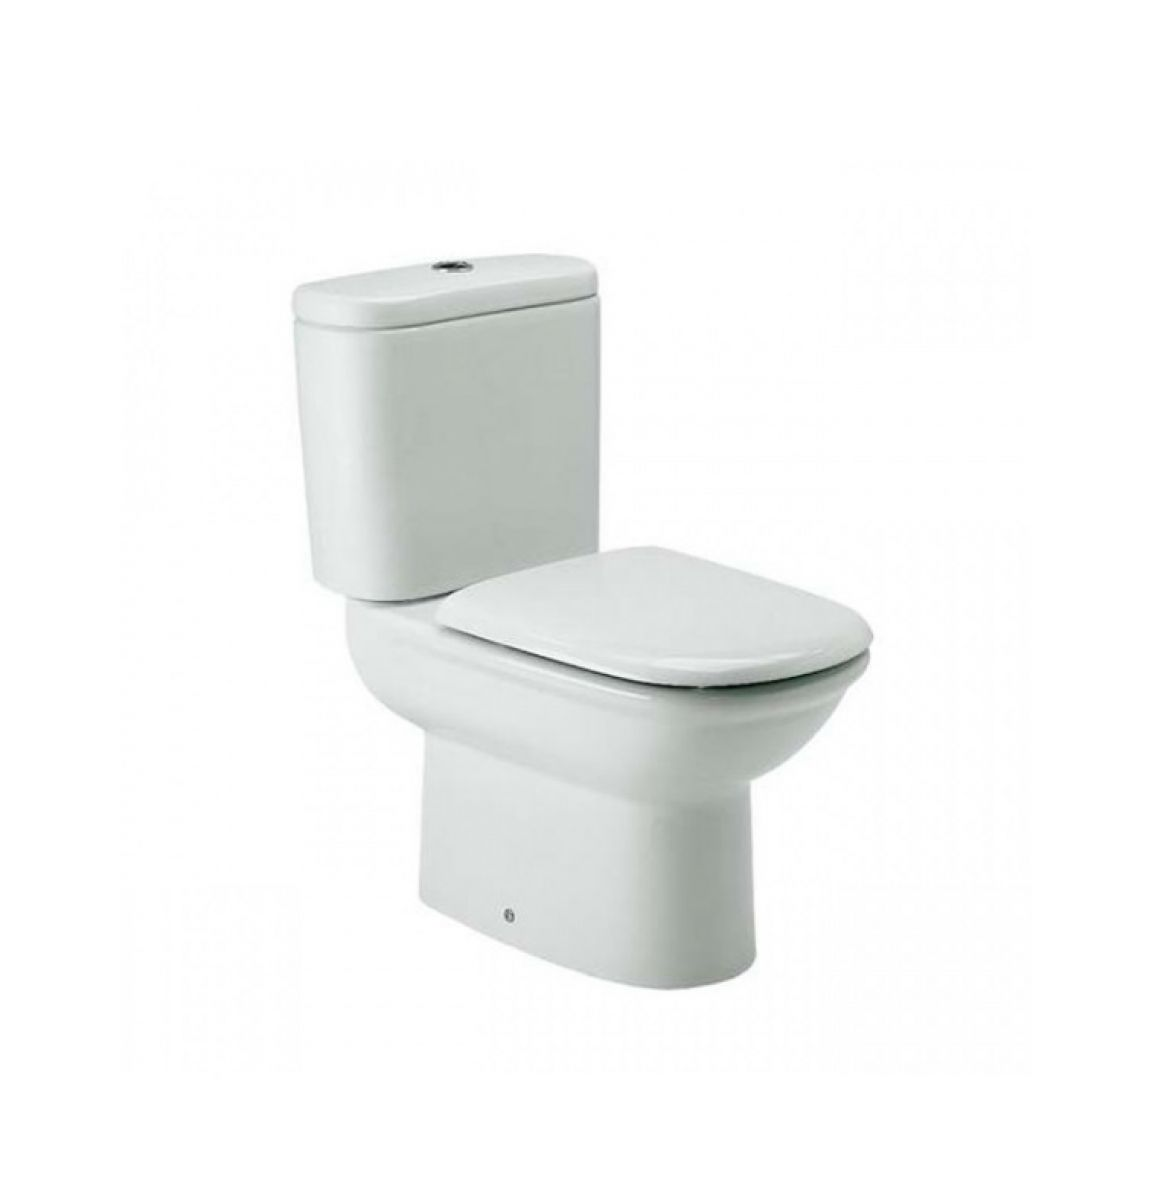 roca giralda close coupled wc suite uk bathrooms. Black Bedroom Furniture Sets. Home Design Ideas